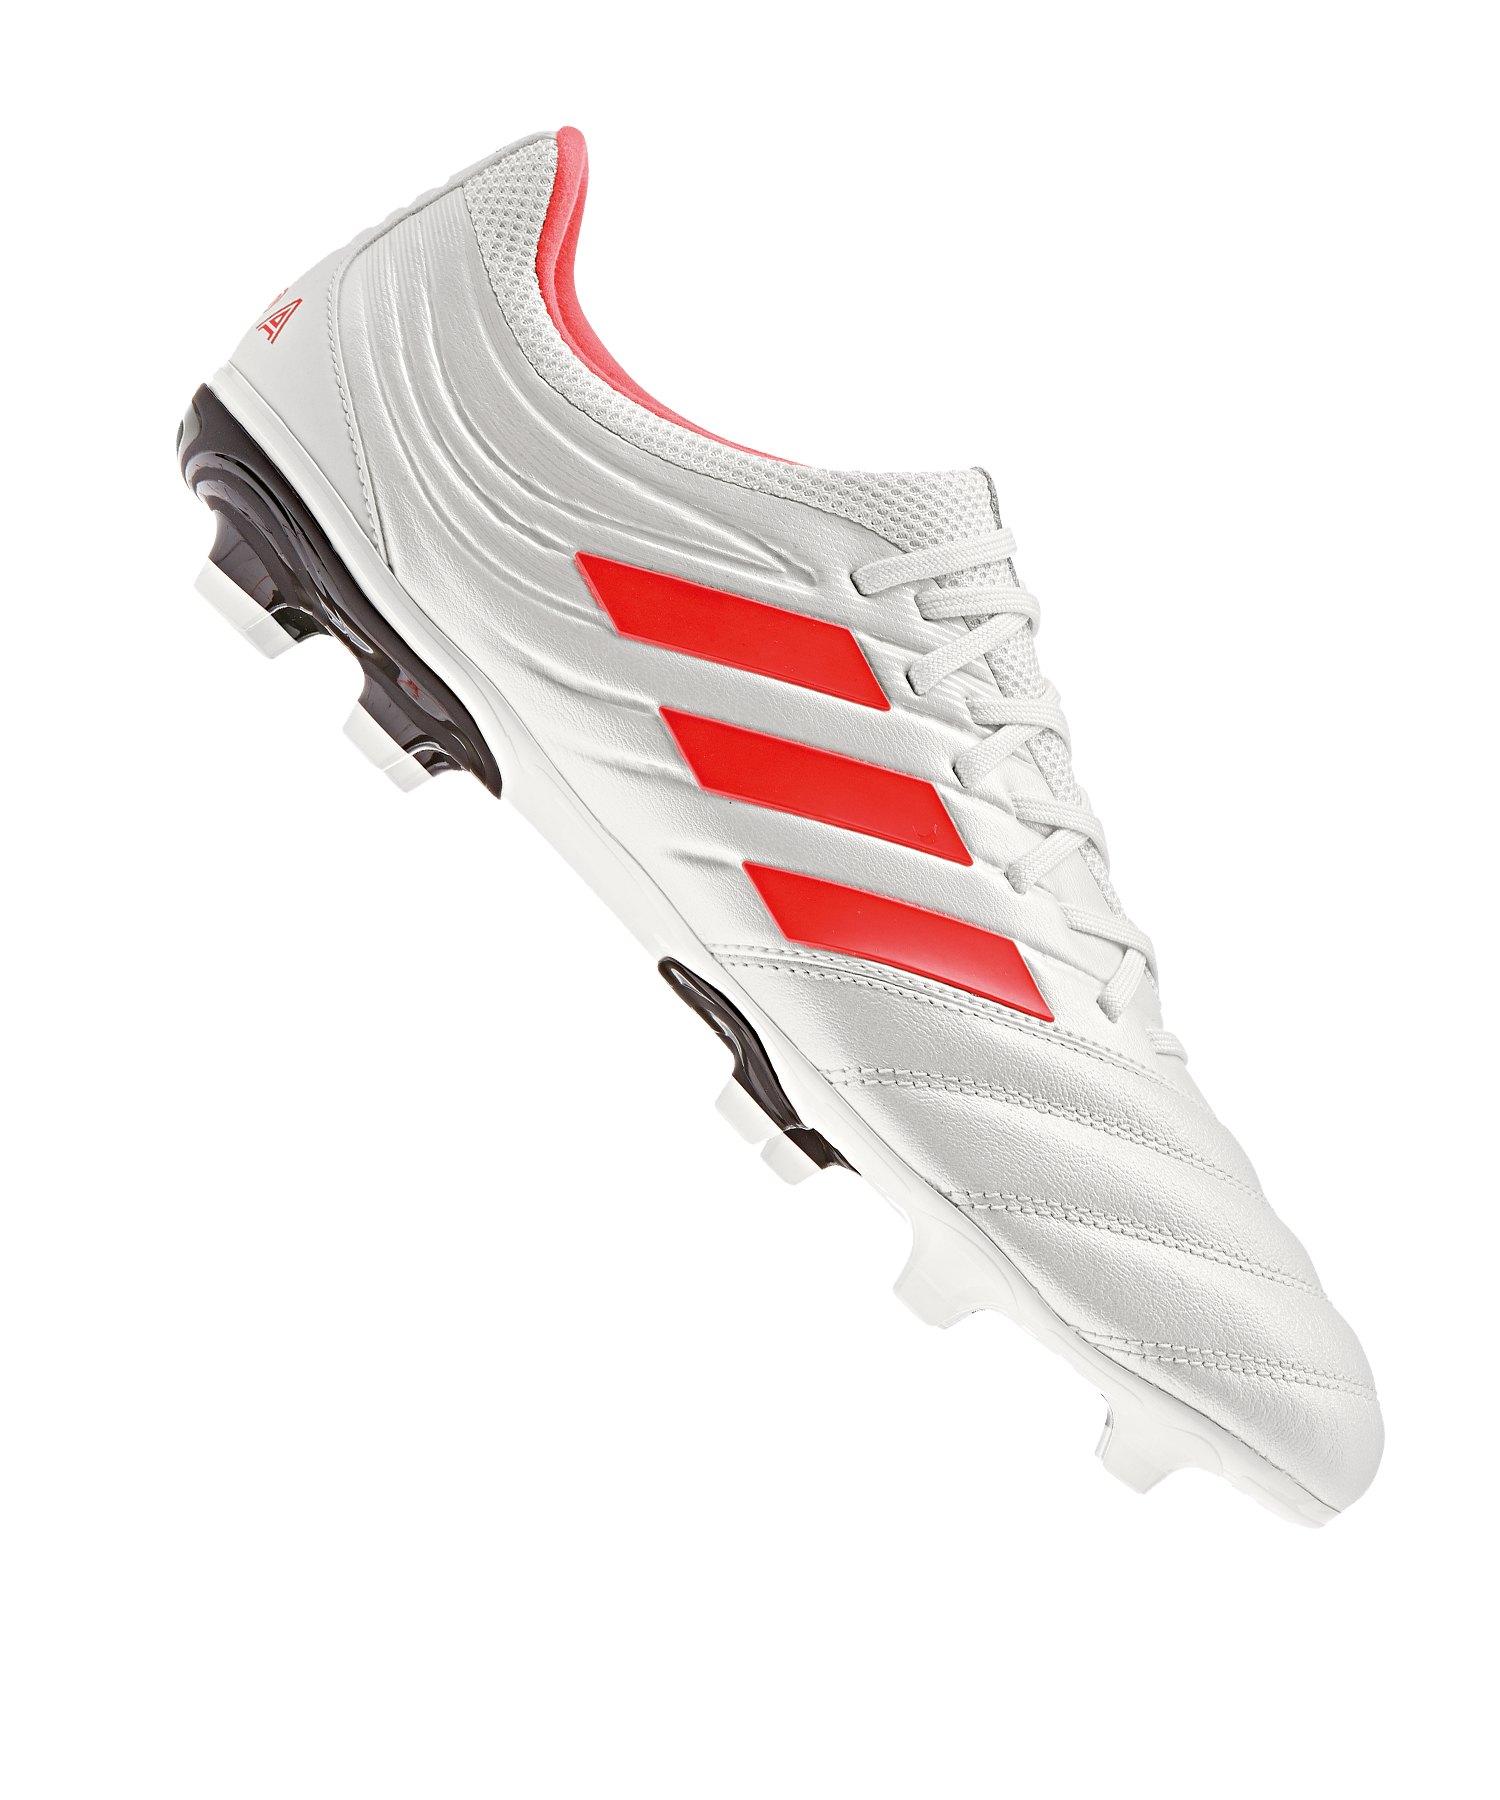 adidas COPA 19.3 FG Weiss Rot